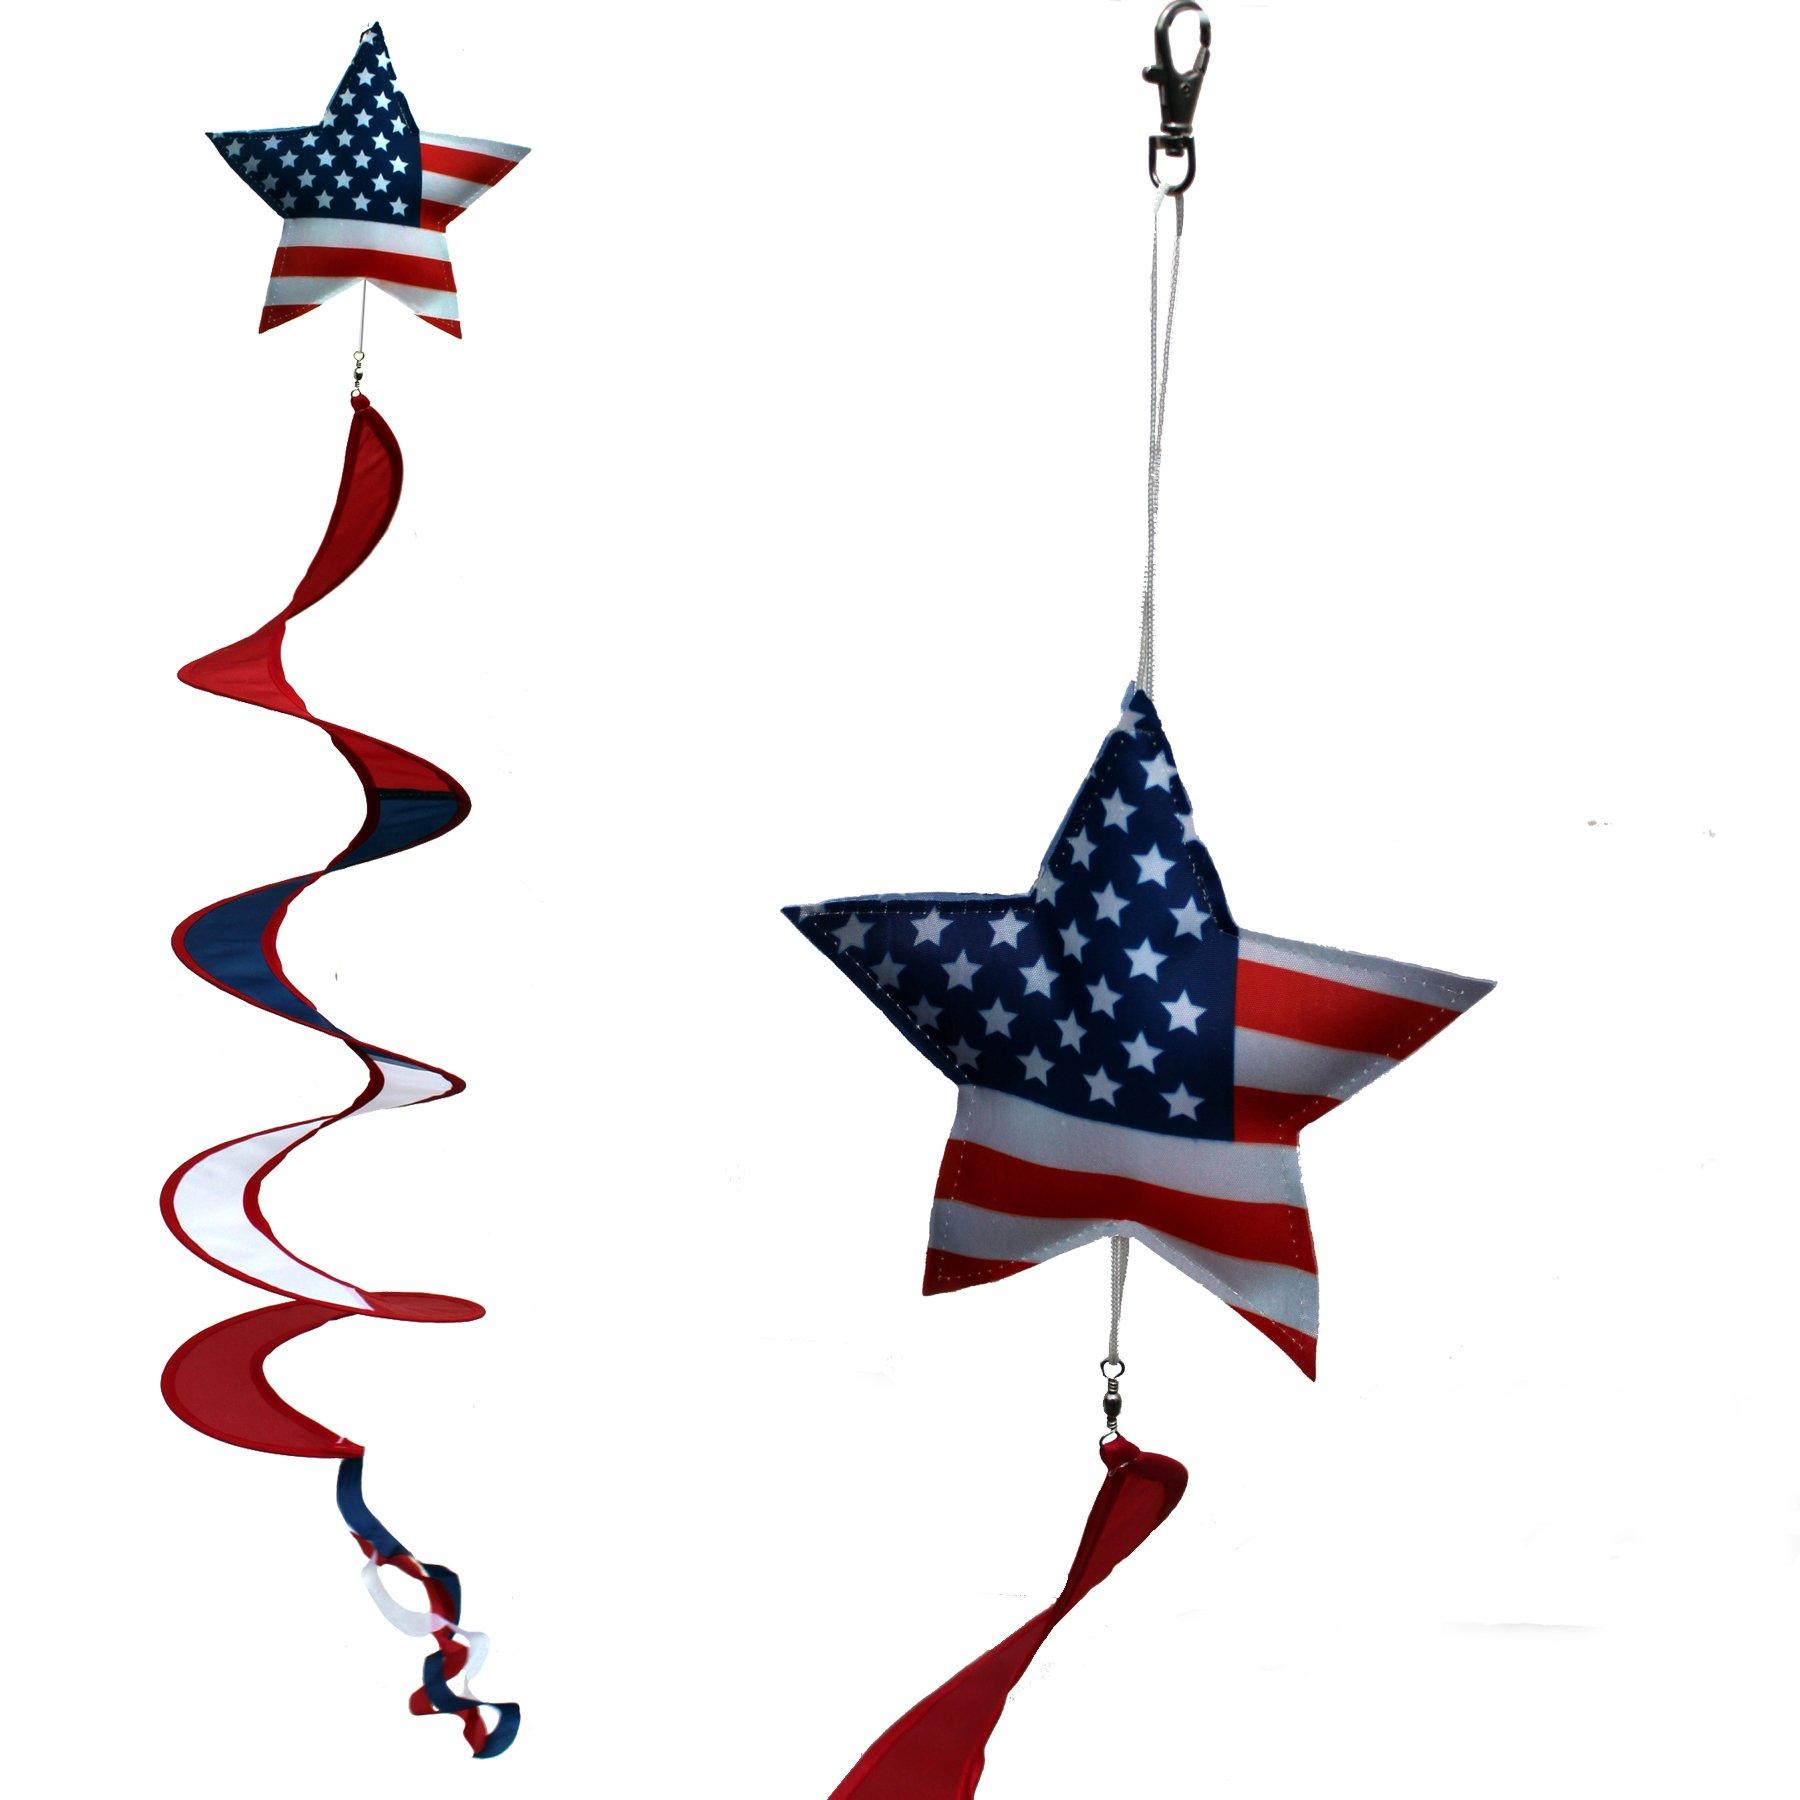 U.S.A. Patriotic Wind Spinner Decoration - American Flag Star, Porch Wind Twirler, Garden Decoration 6'' x 40'' Long